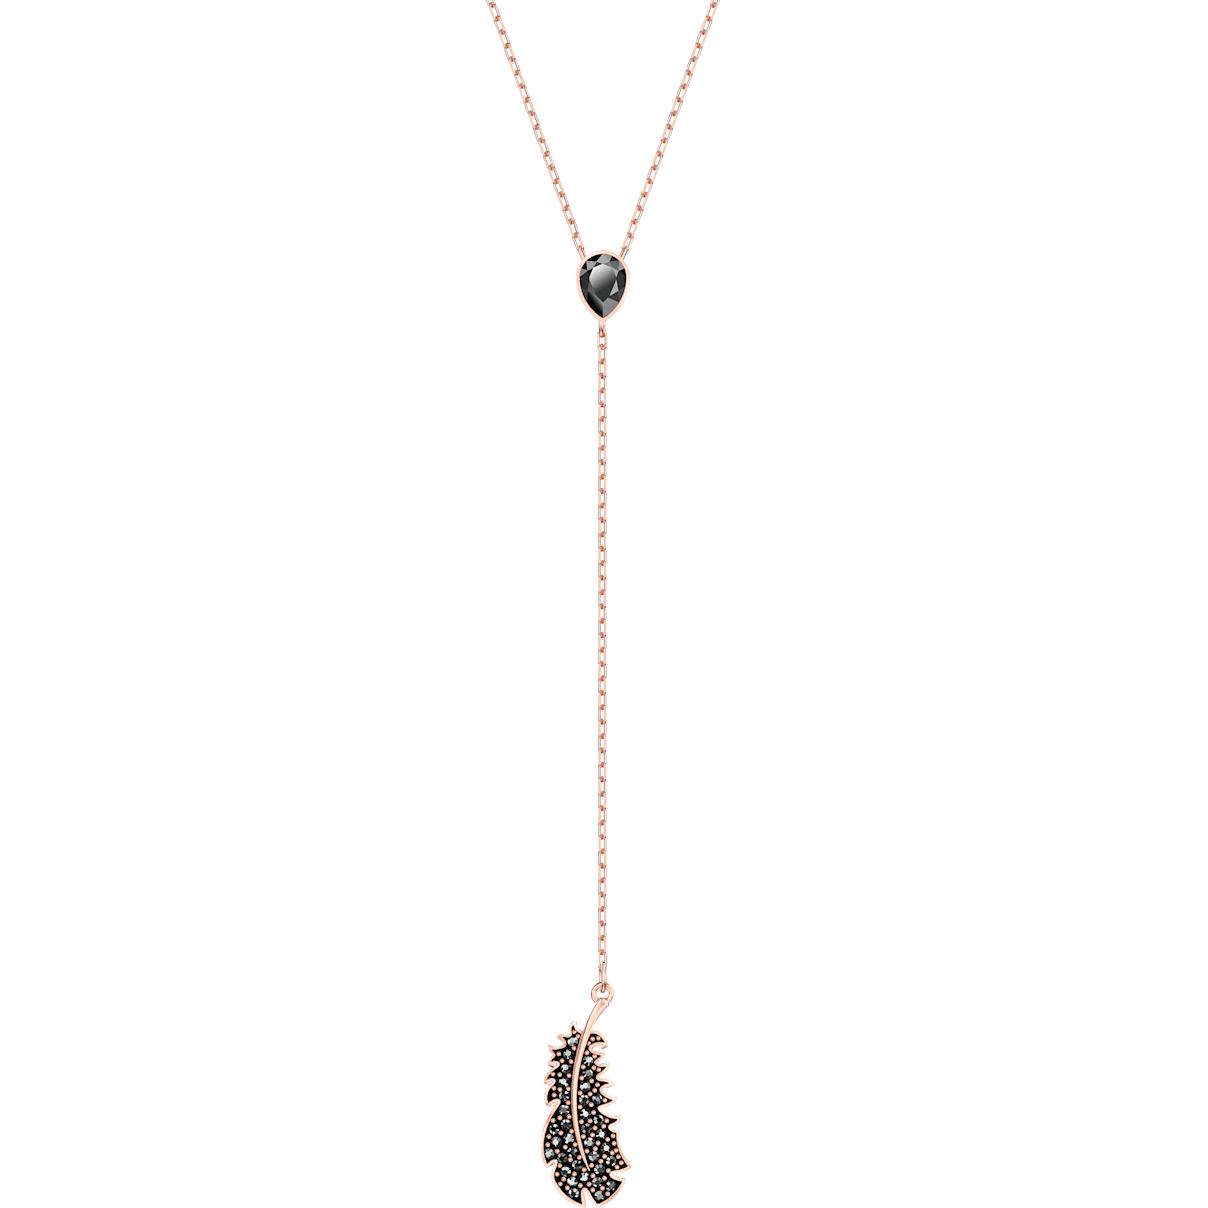 Swarovski Naughty Y Necklace, Black, Rose-gold tone plated